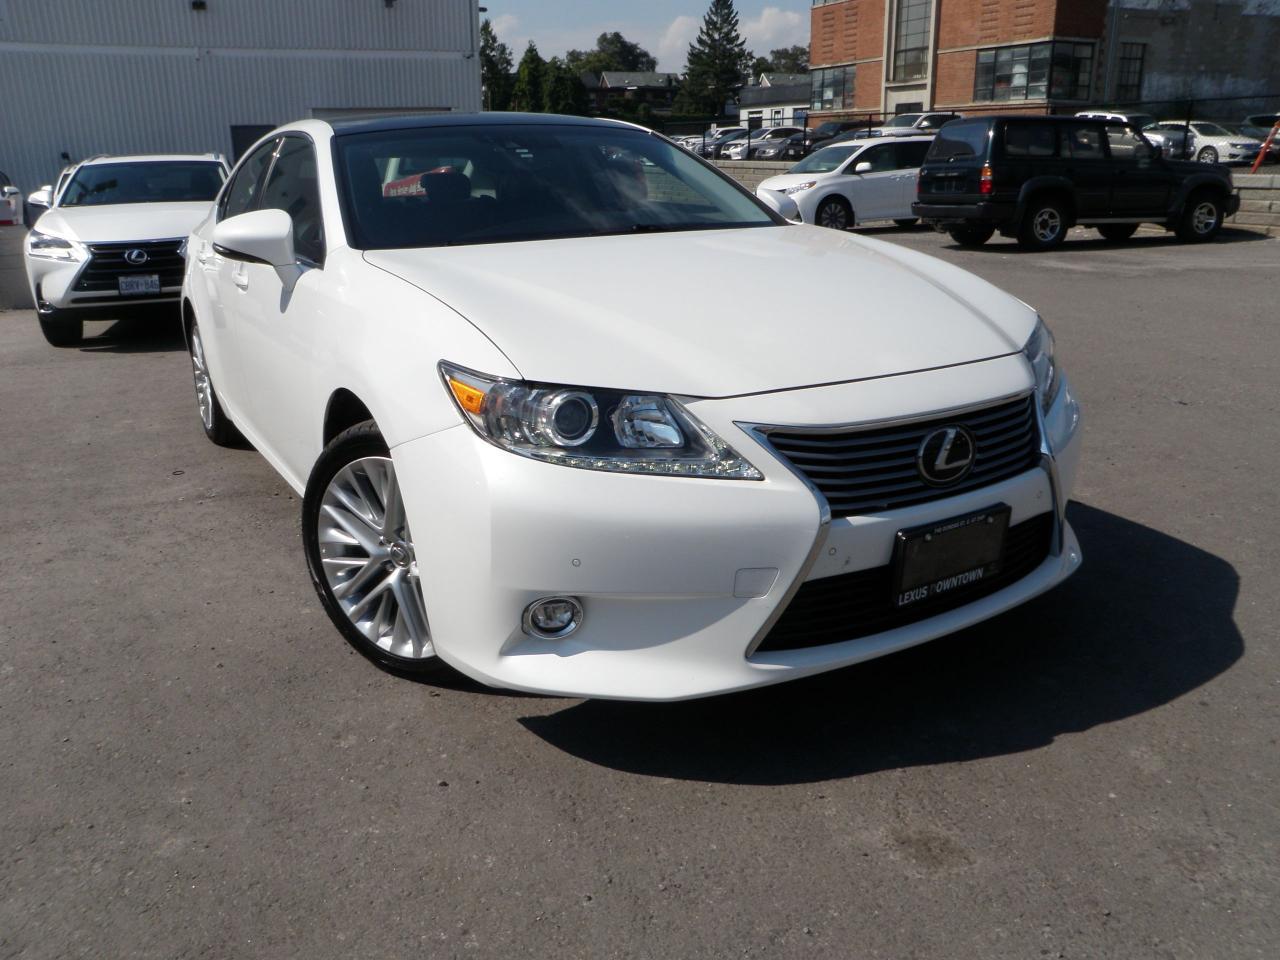 Photo of White 2014 Lexus ES 350